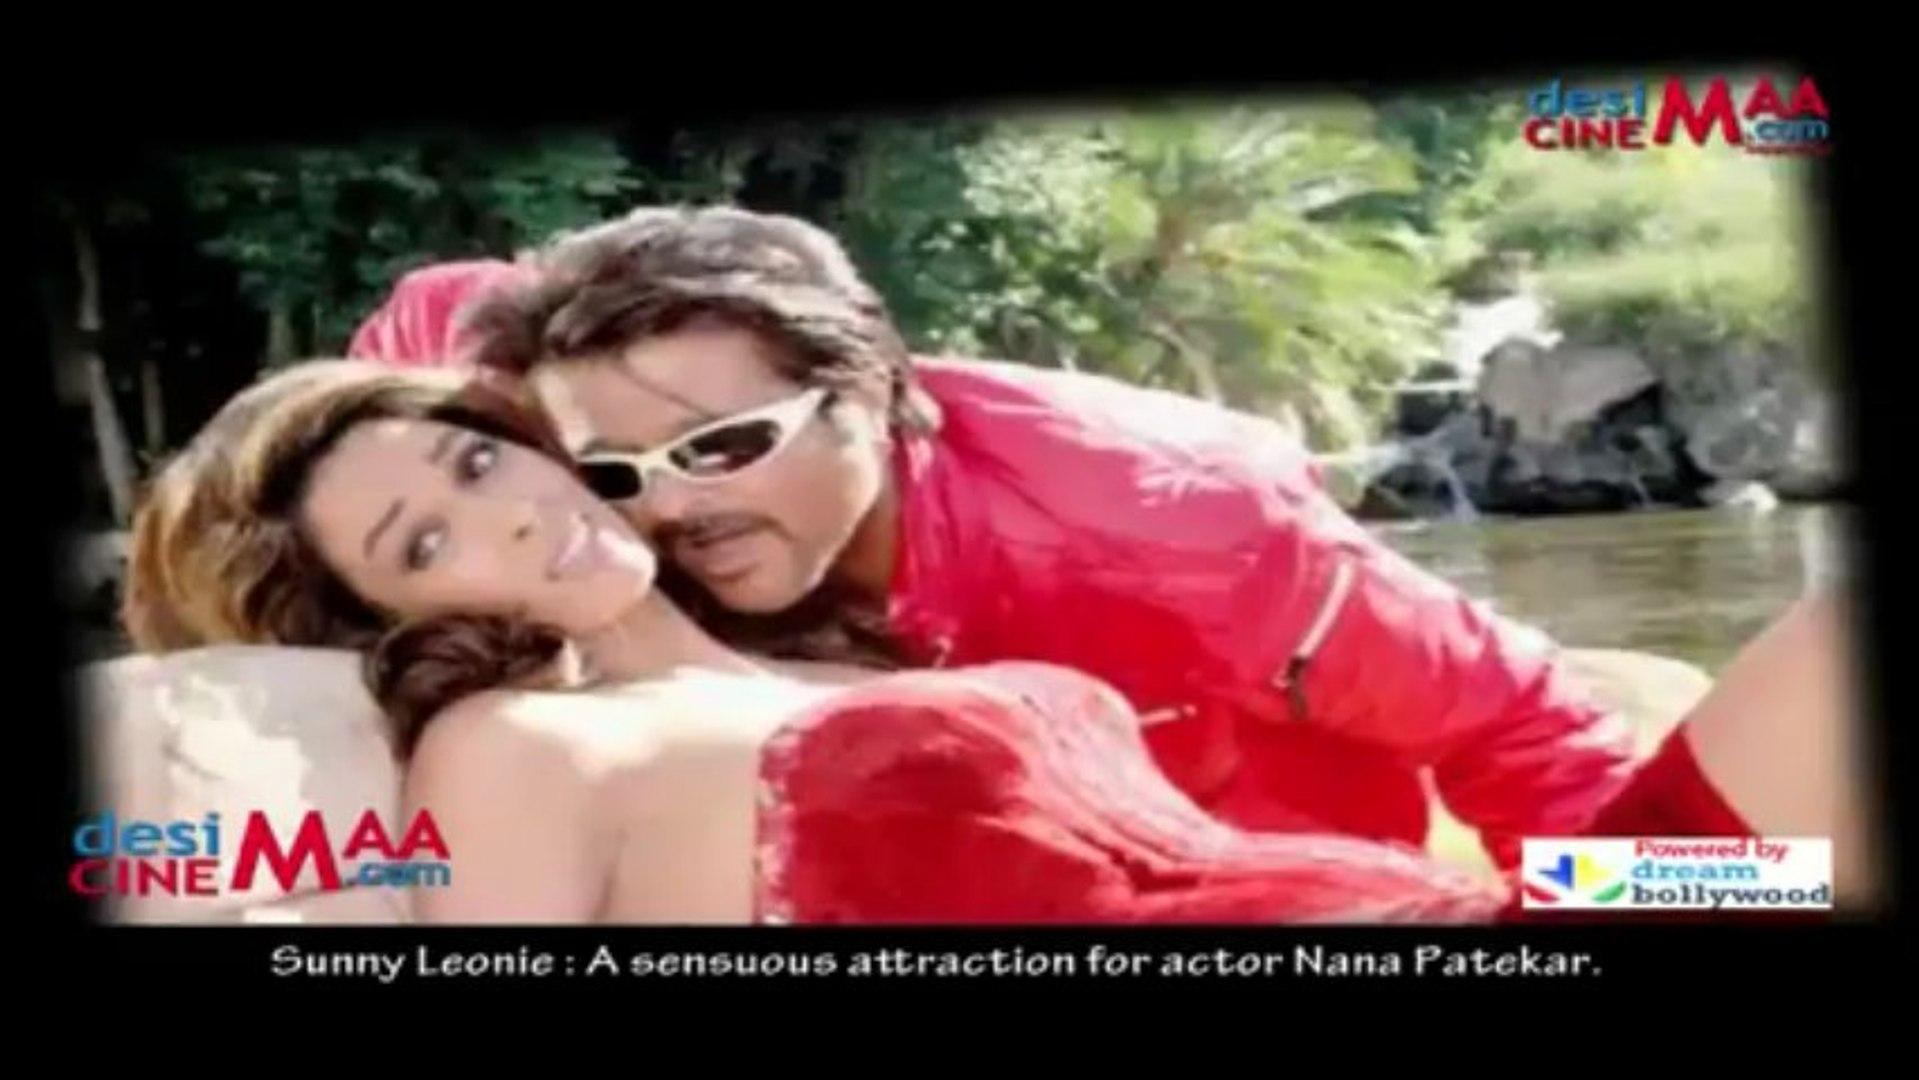 Sunny Leonie : A sensuous attraction for actor Nana Patekar